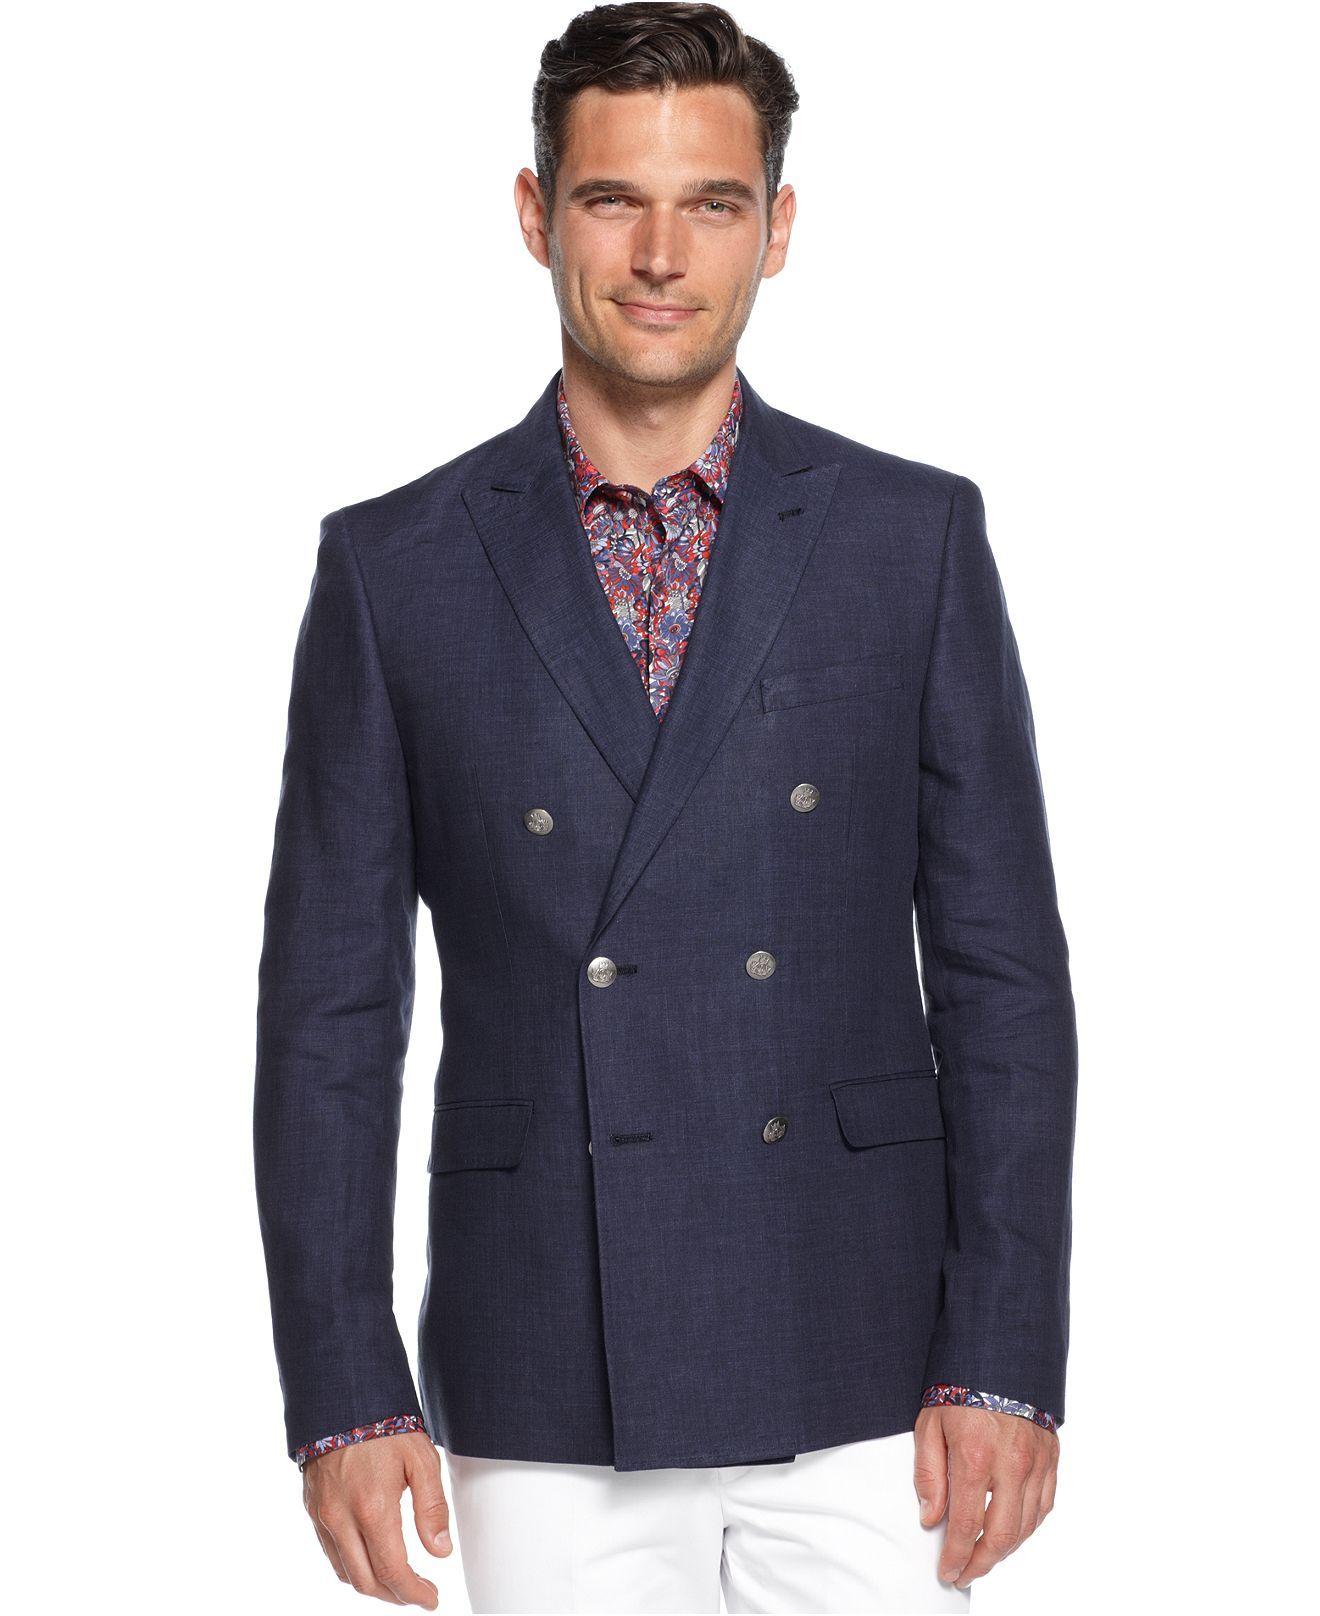 Tallia Orange Jacket, Navy Double Breasted Blazer